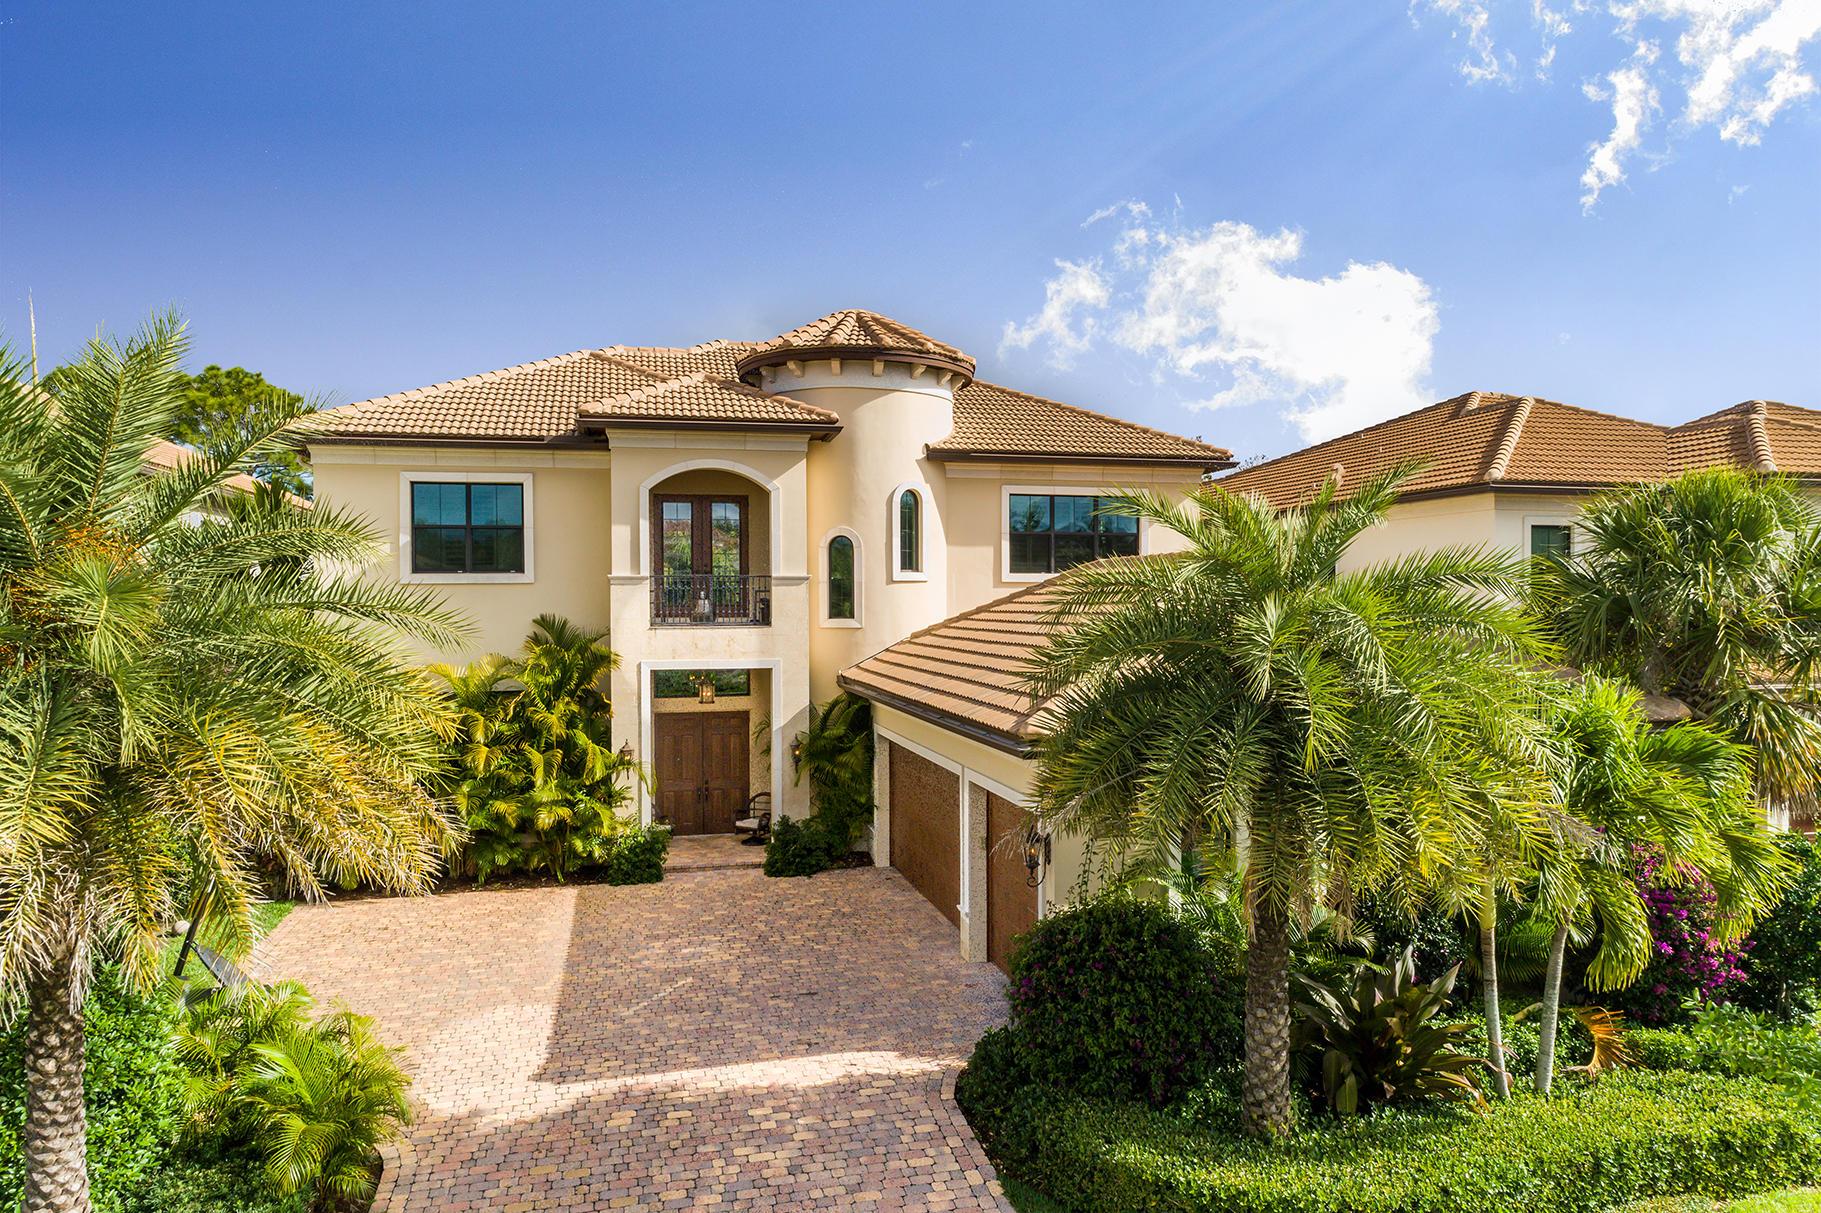 145 Gardenia Isle Drive, Palm Beach Gardens, Florida 33418, 5 Bedrooms Bedrooms, ,5.2 BathroomsBathrooms,Single Family,For Sale,Gardenia Isle,RX-10517619